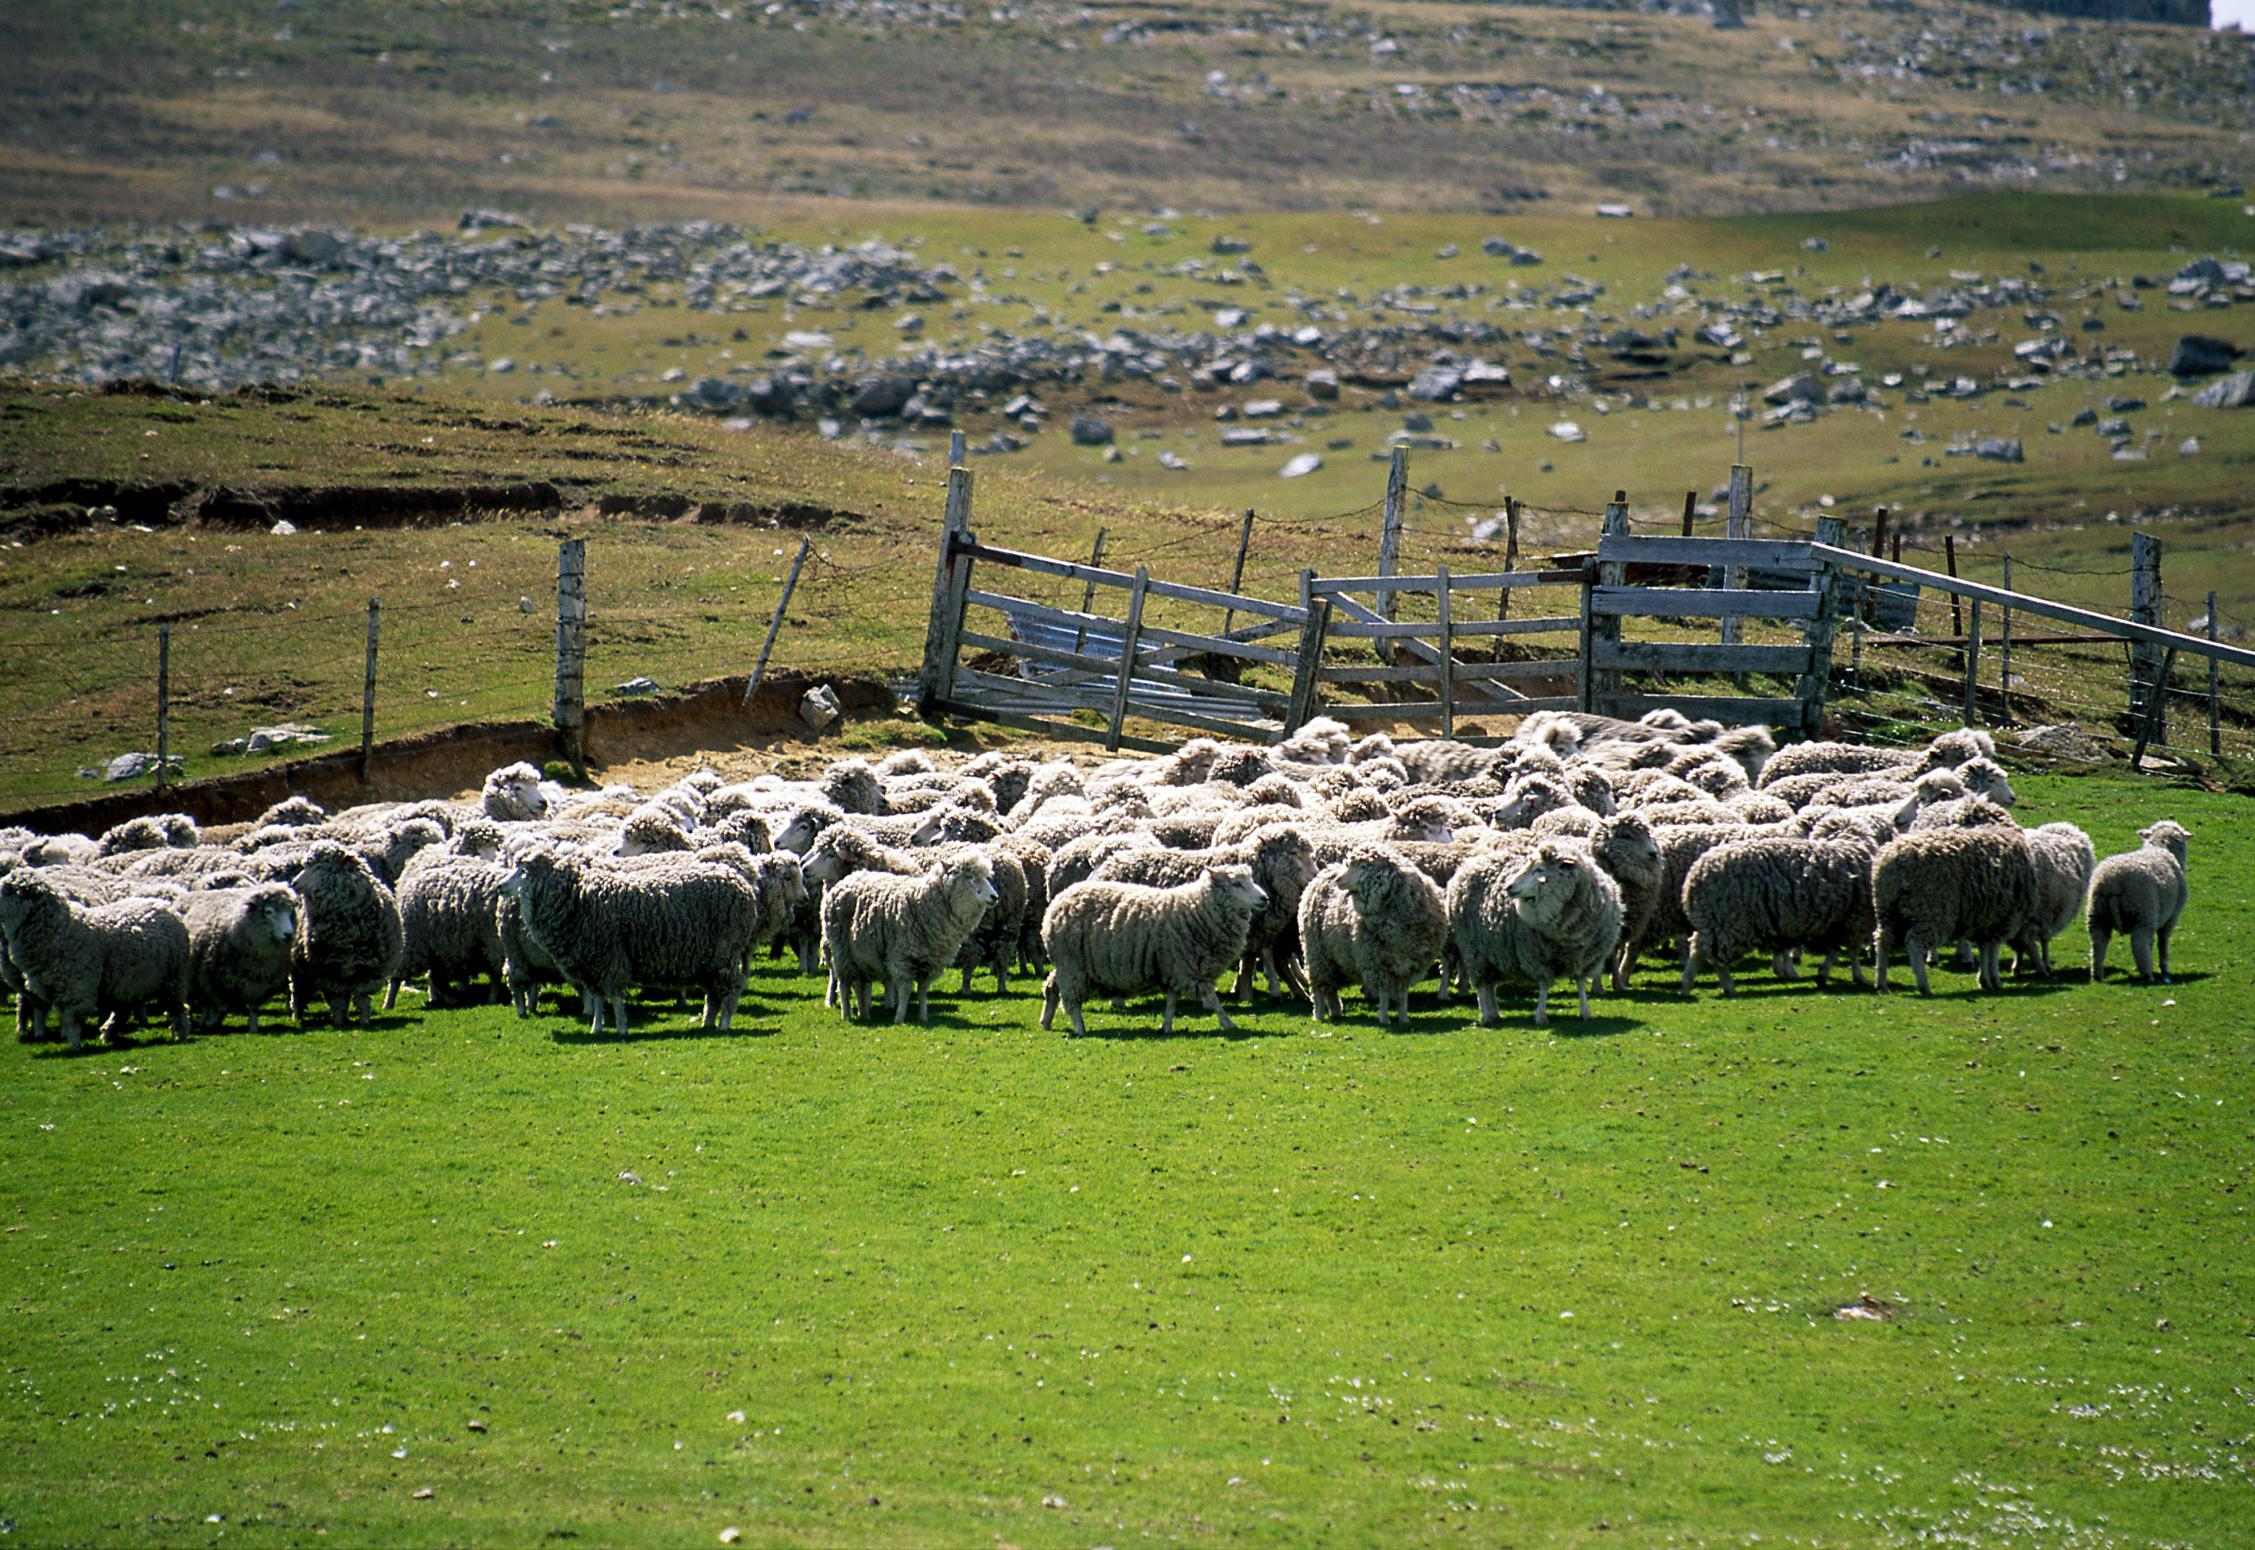 Corral of sheep, Port Stanley, Falkland Islands